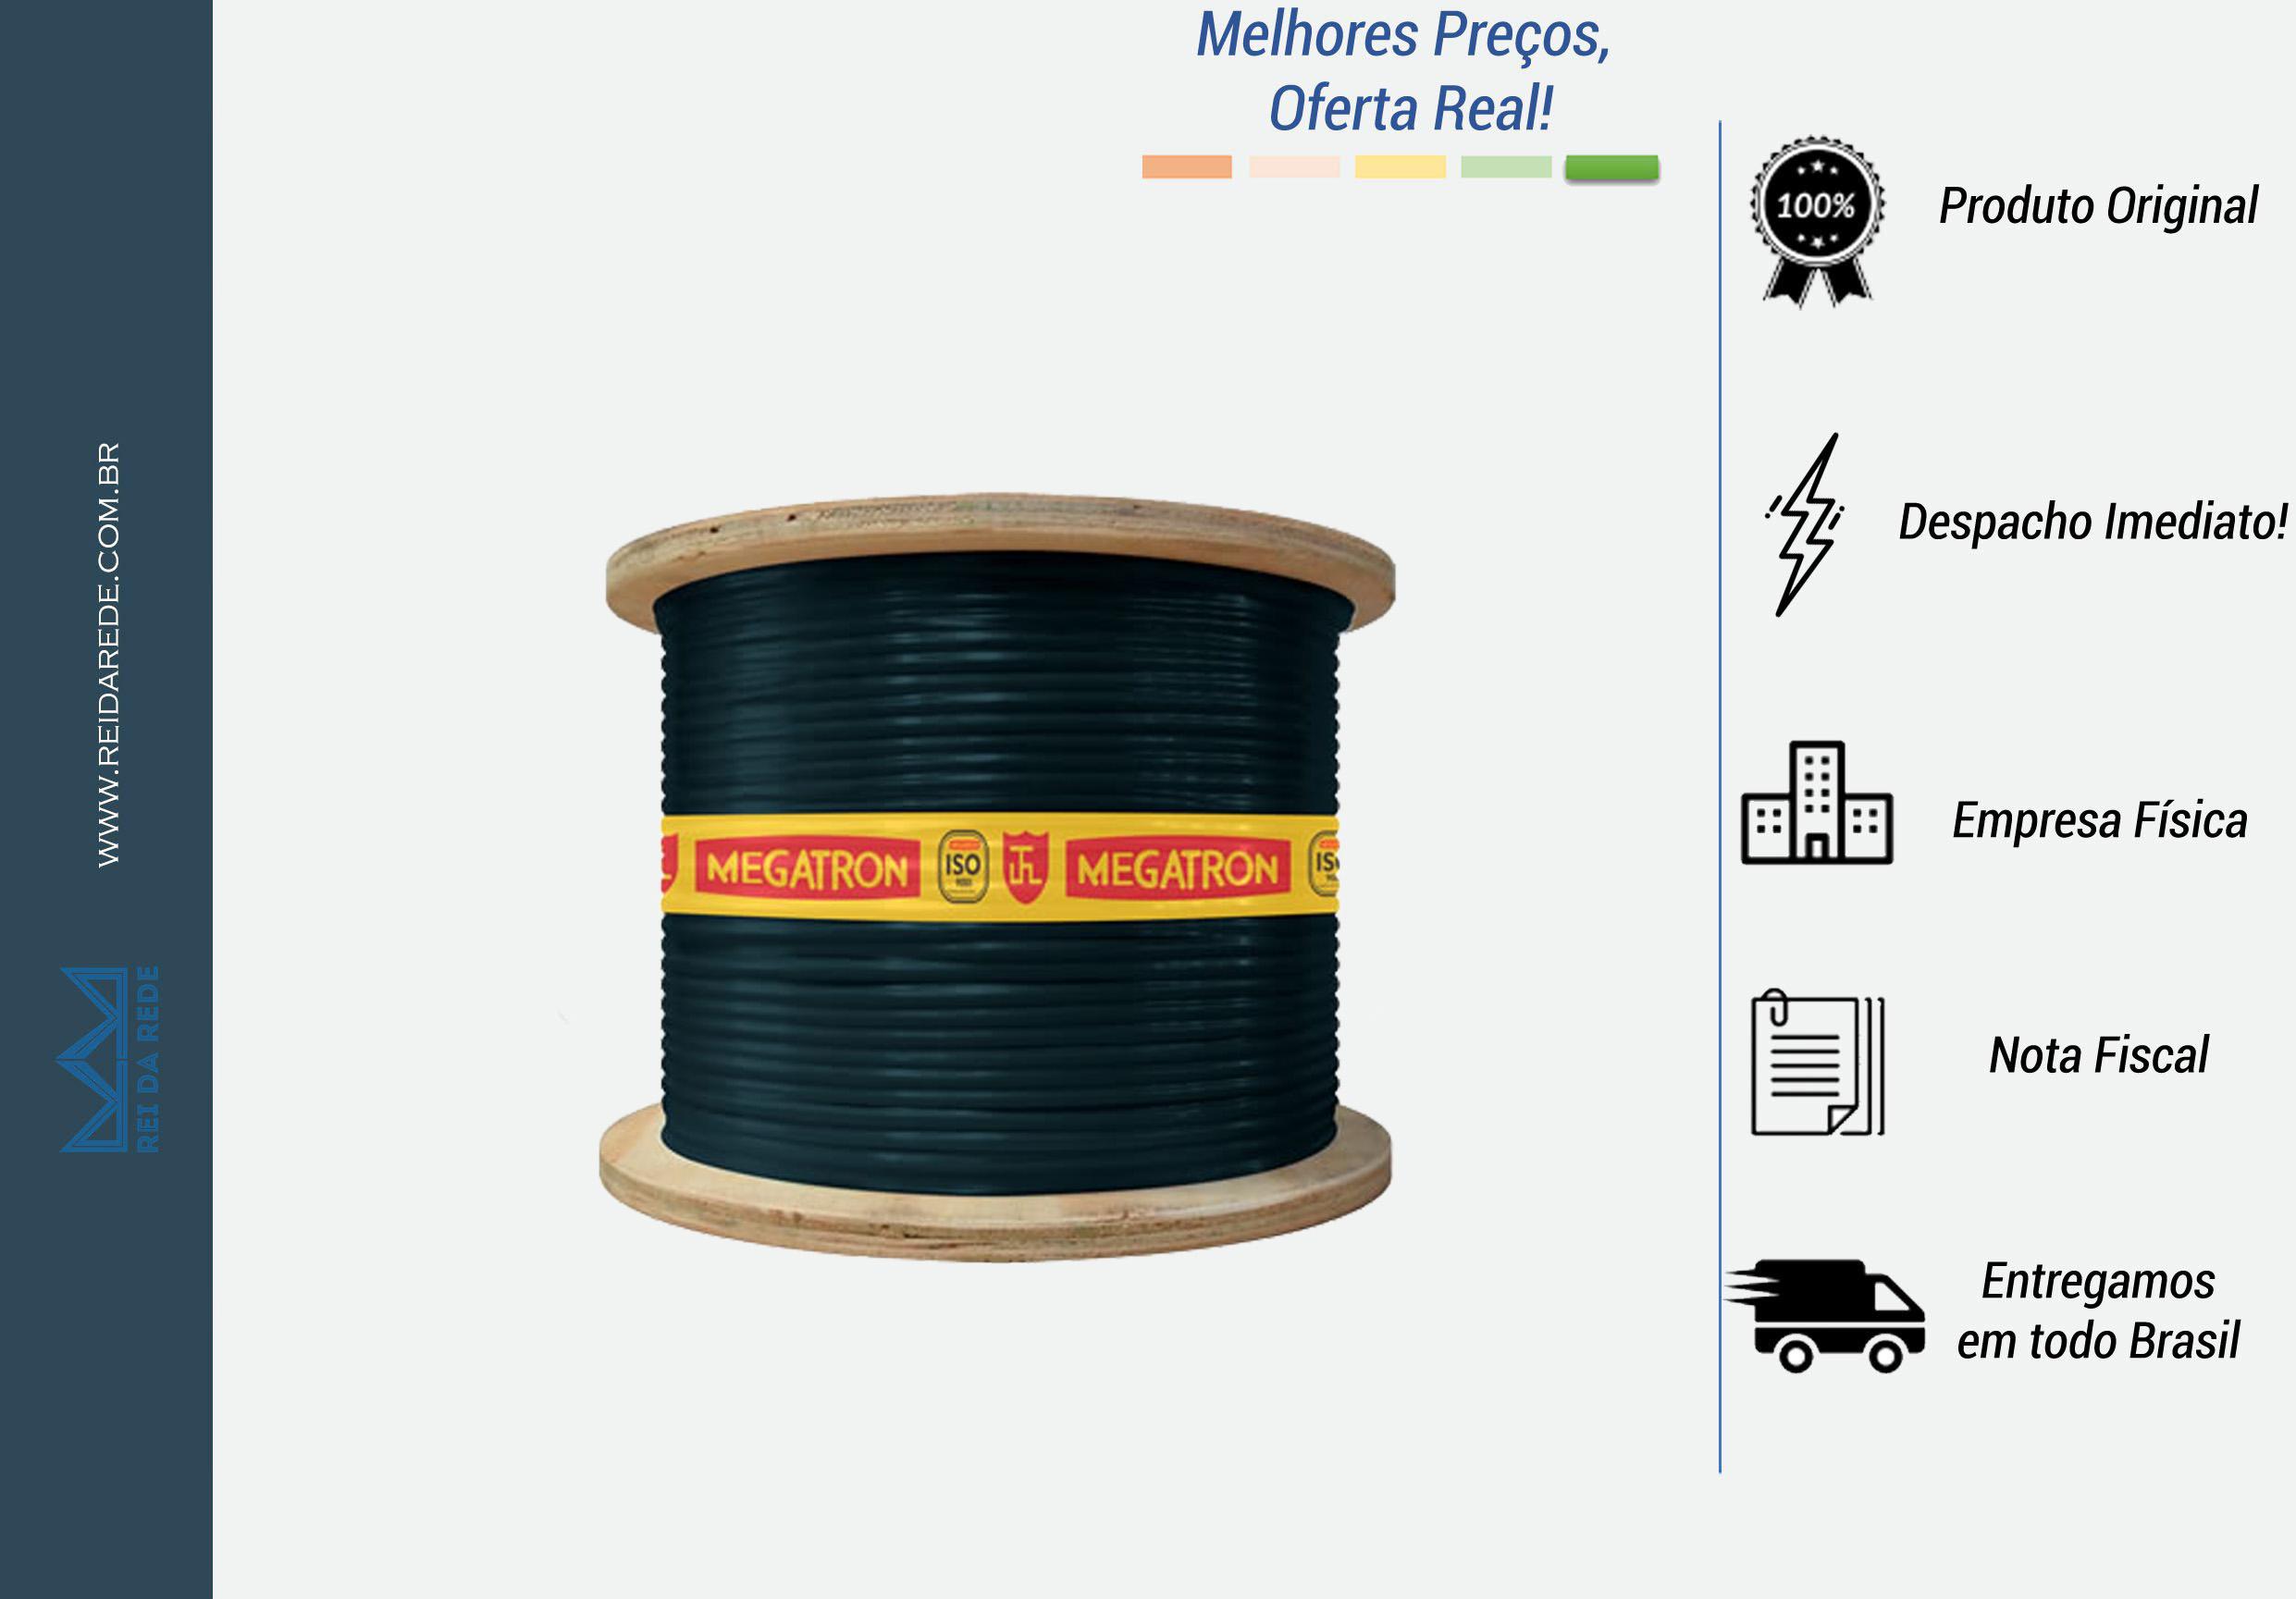 CABO DE REDE ESPECIAL DUPLA BLINDAGEM CAT5E LAN 4P BOBINA 500 METROS PRETO DVBL MEGATRON - MARCA: MEGATRON  - MODELO: DUPLA BLINDAGEM CAT5E LAN 4P